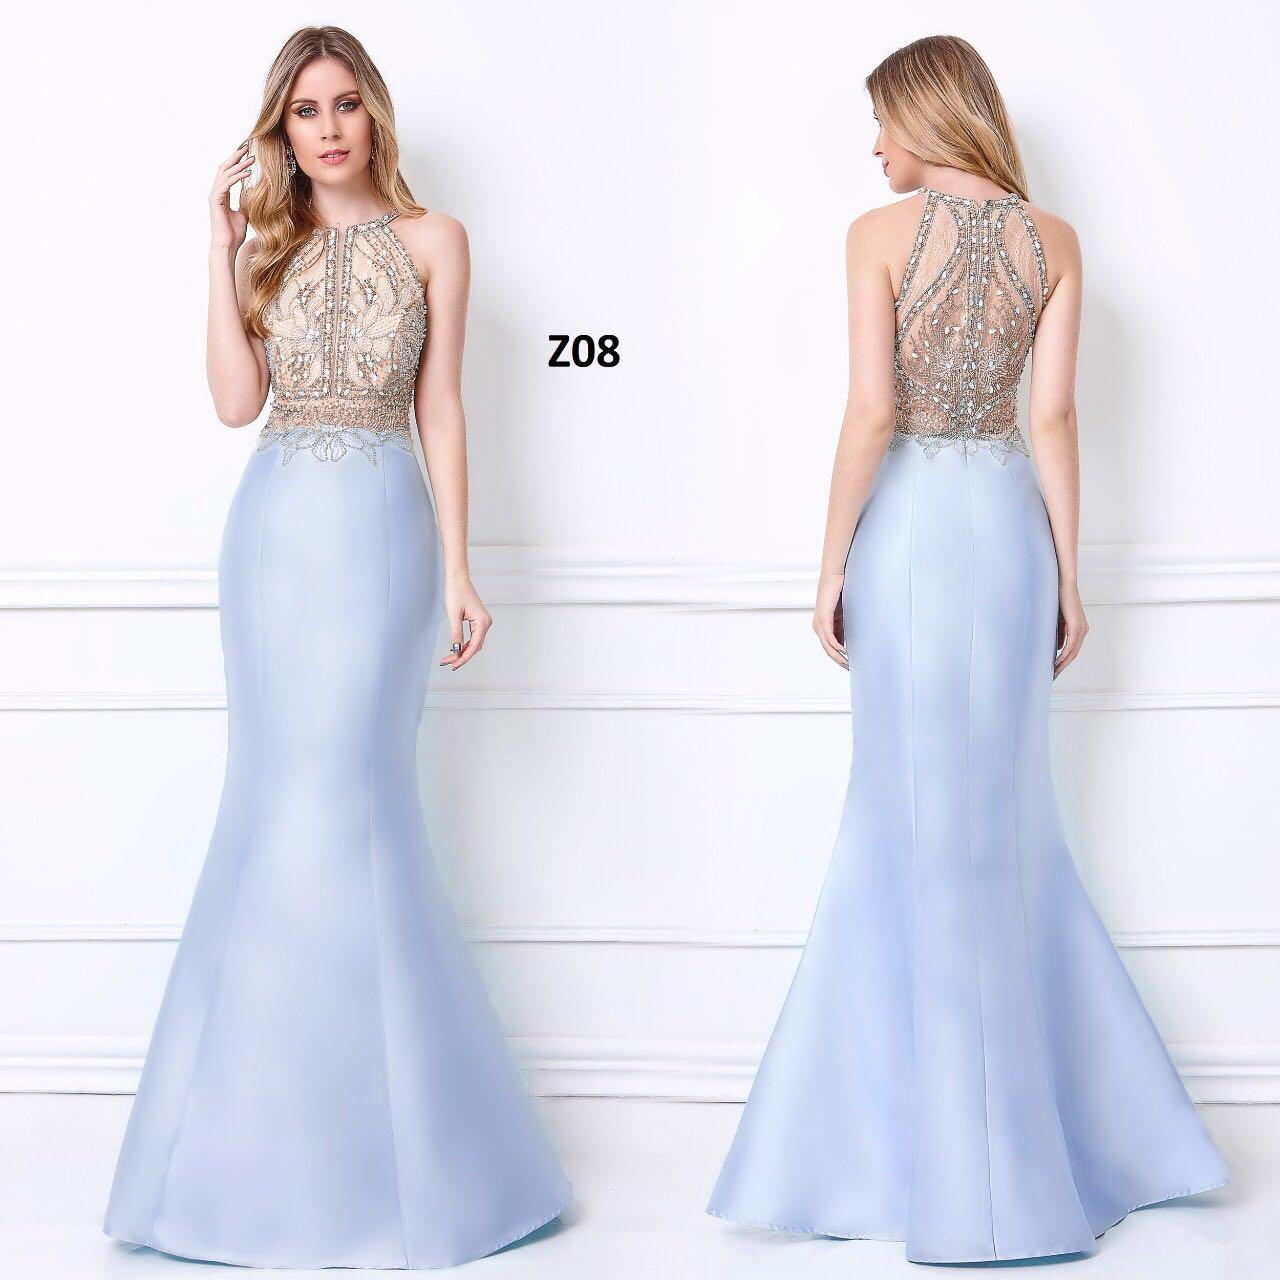 Vestido de festa longo estilo sereia azul